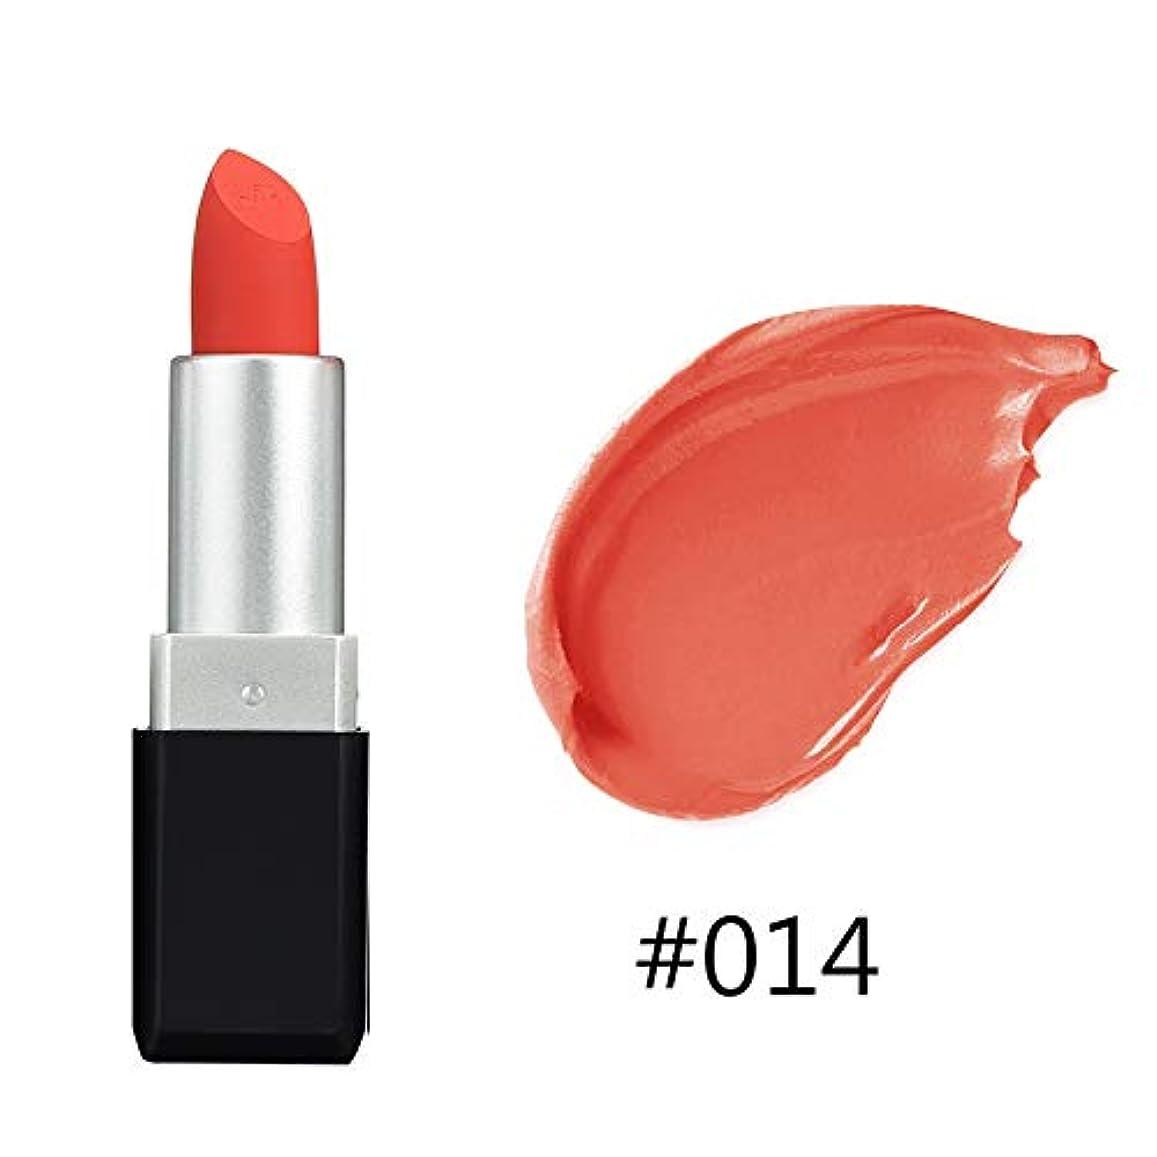 Symboat 口紅 落ちにくい 長持ち 保湿 マット 化粧品 女性用 ポータブル ギフト 絶妙な贈り物 口紅グロス 韓国 リップ 化粧品 グロス ランキング